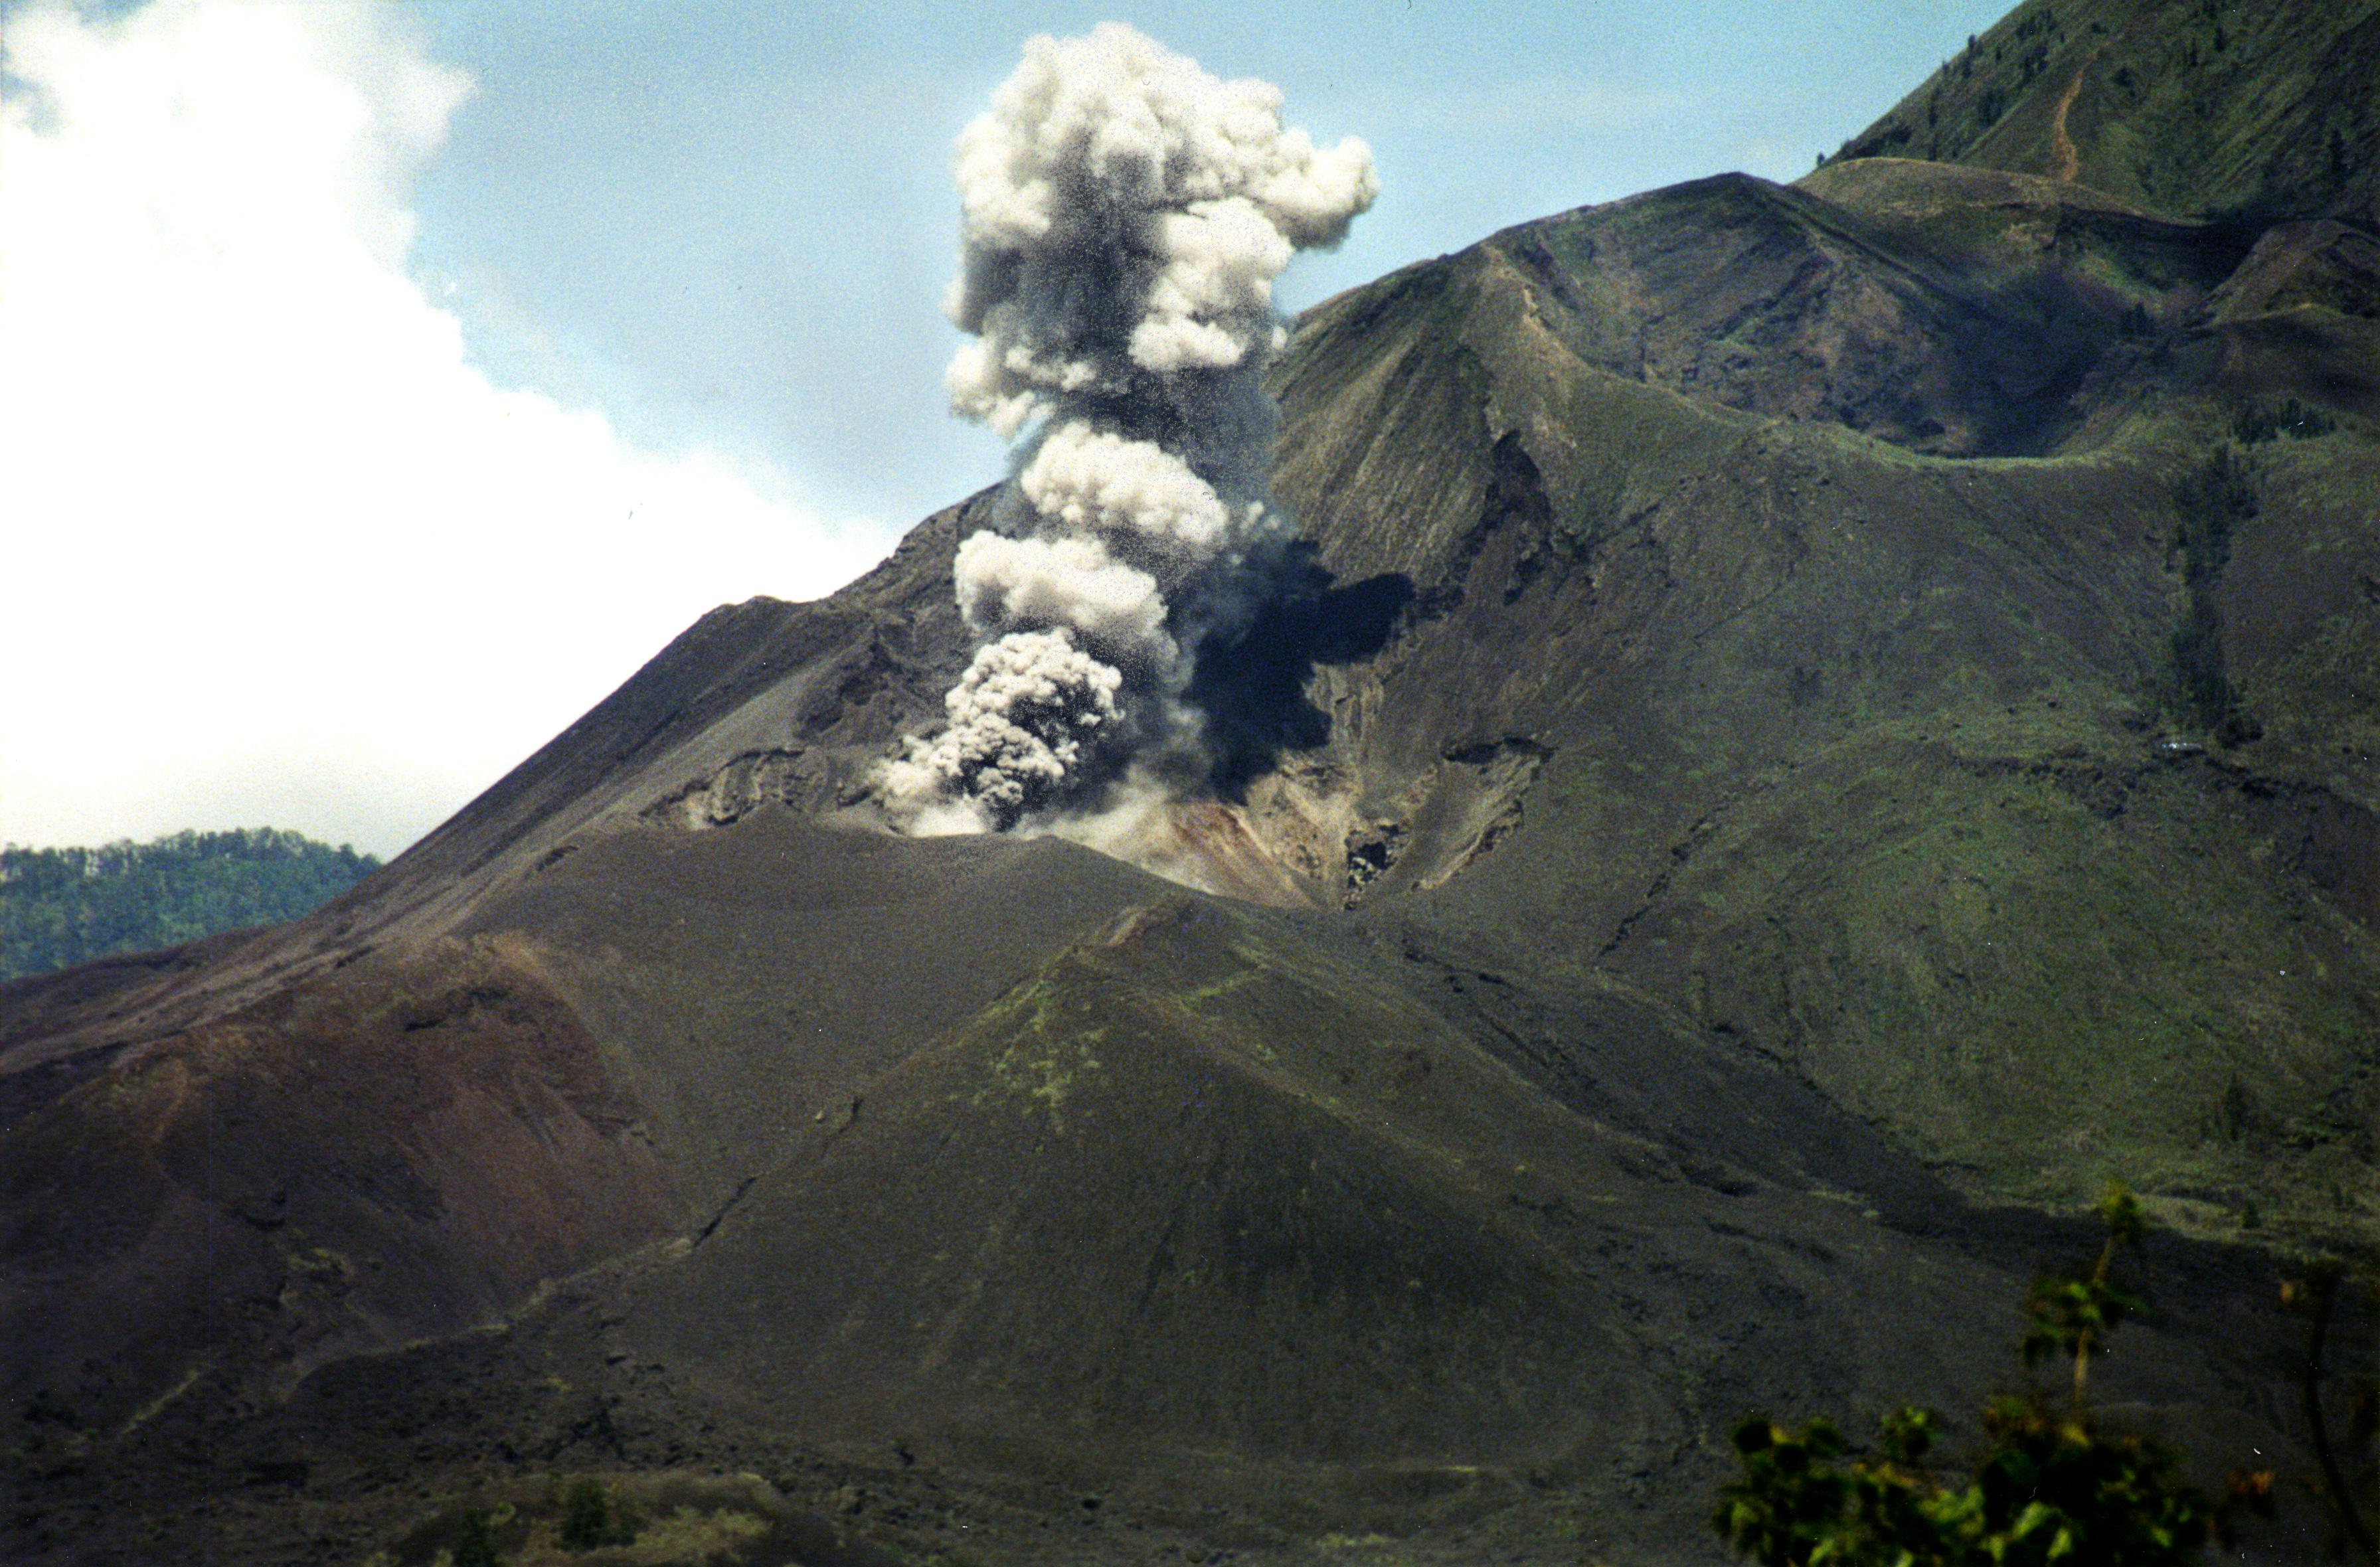 indonesia volcano eruption foto bugil bokep 2017